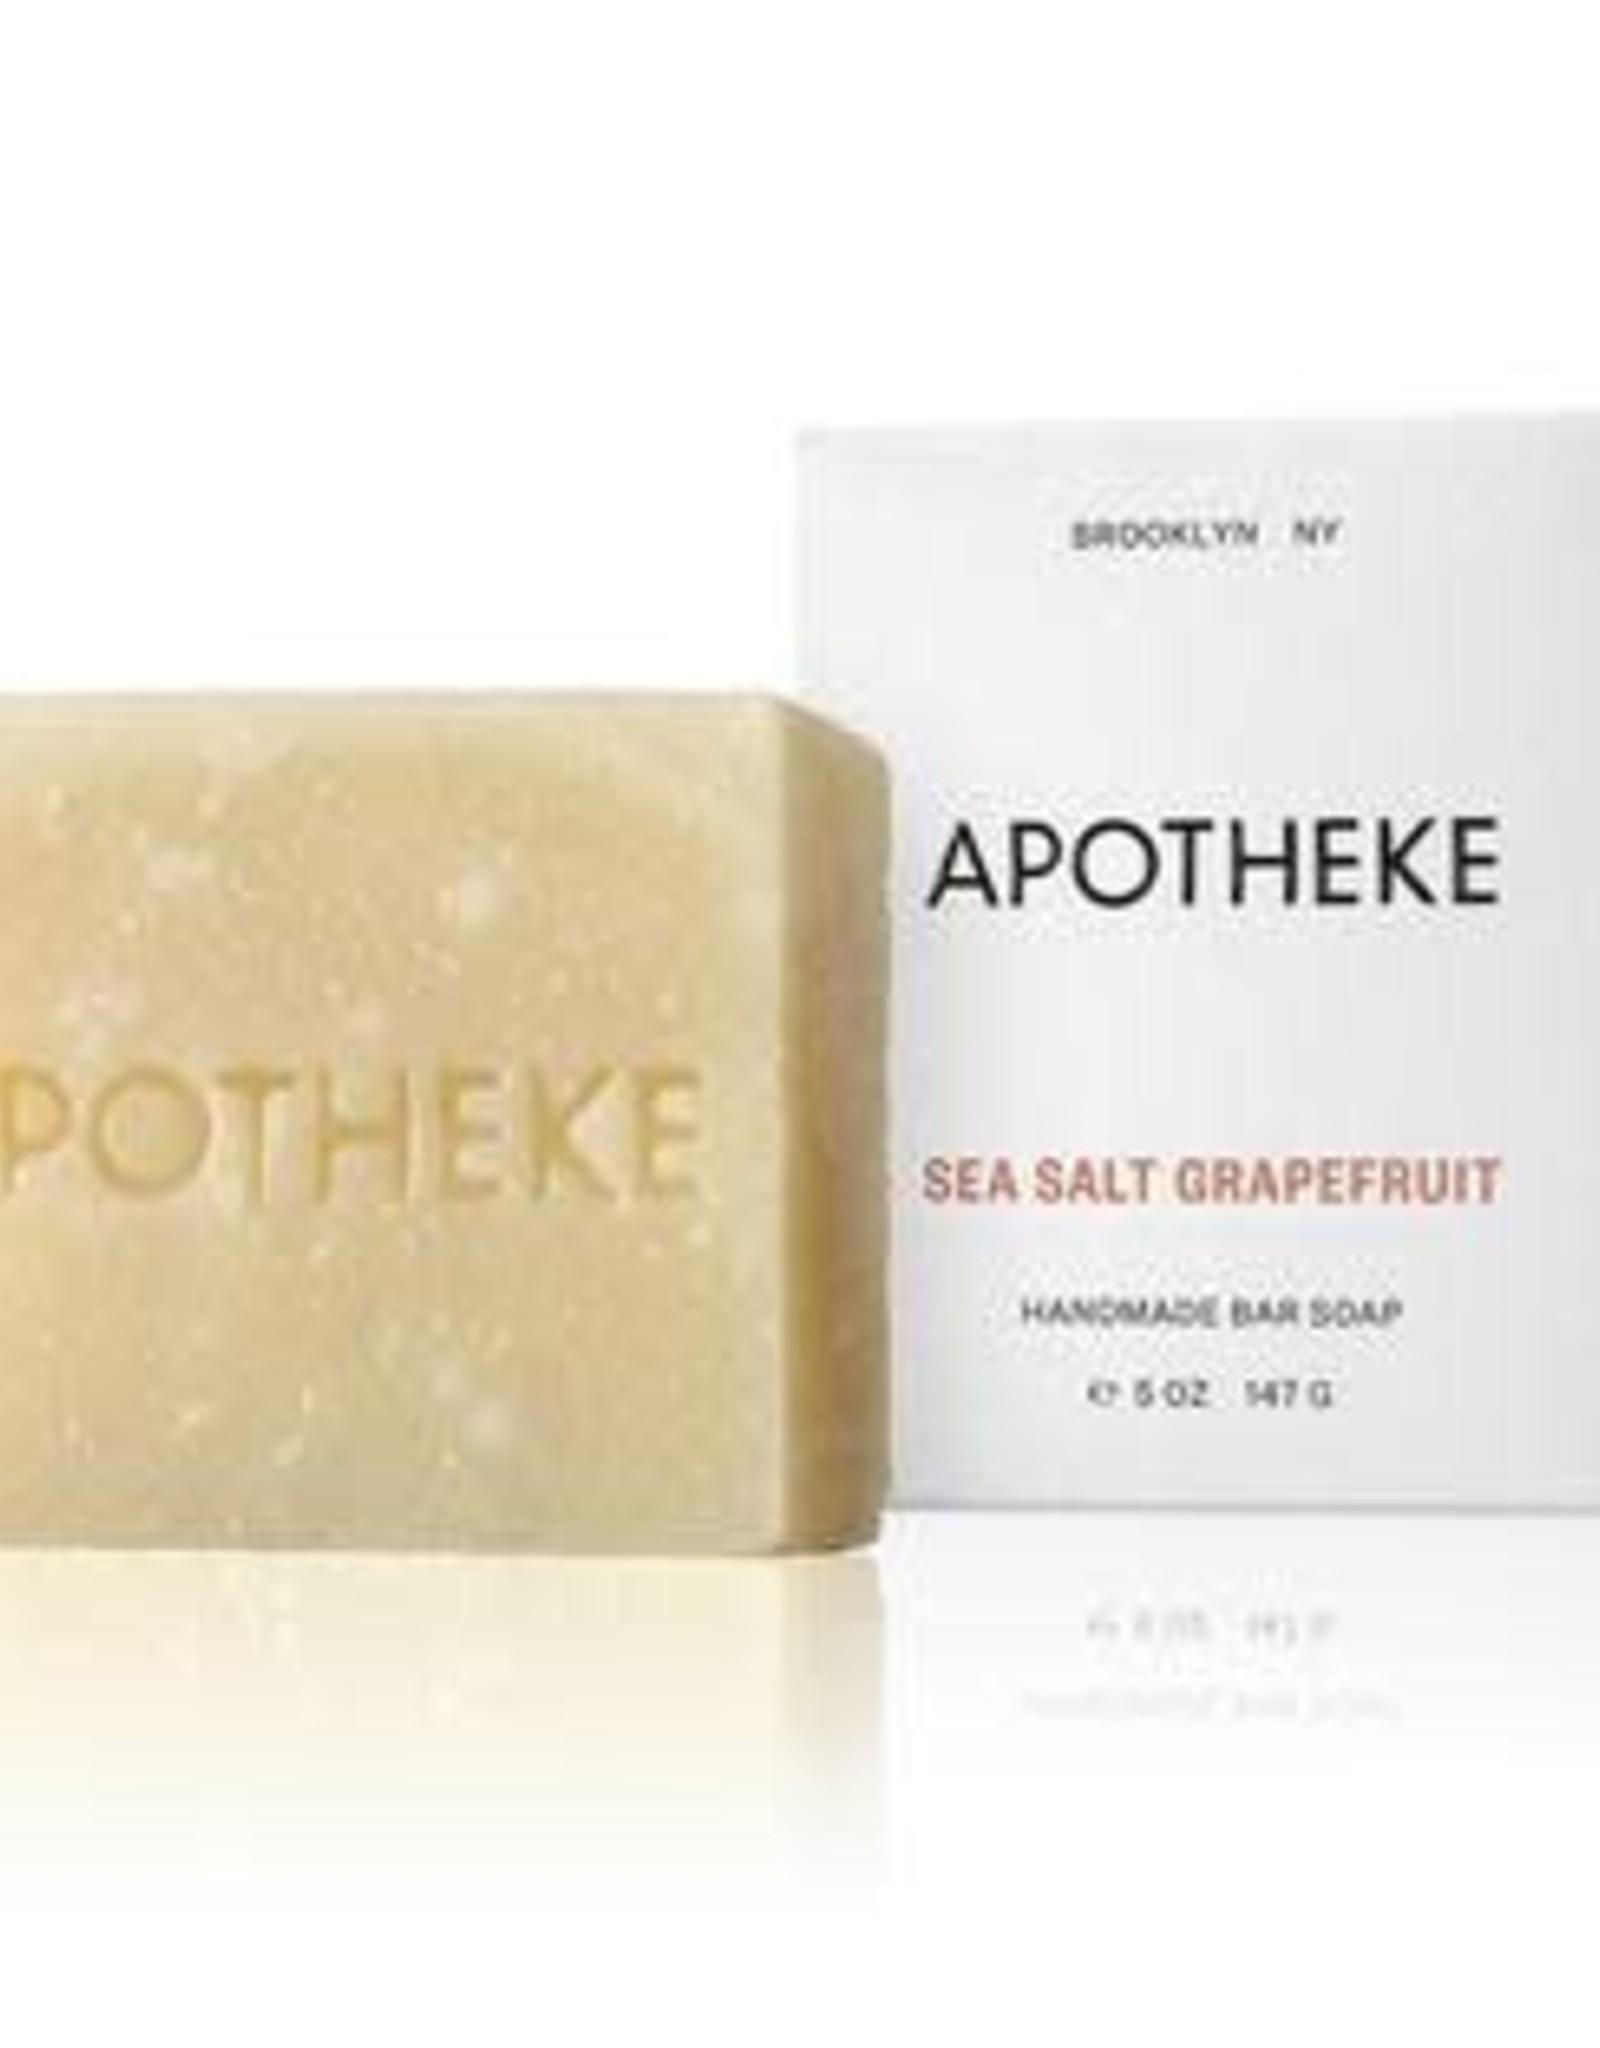 Apotheke Apotheke Sea Salt Grapefruit Bar Soap